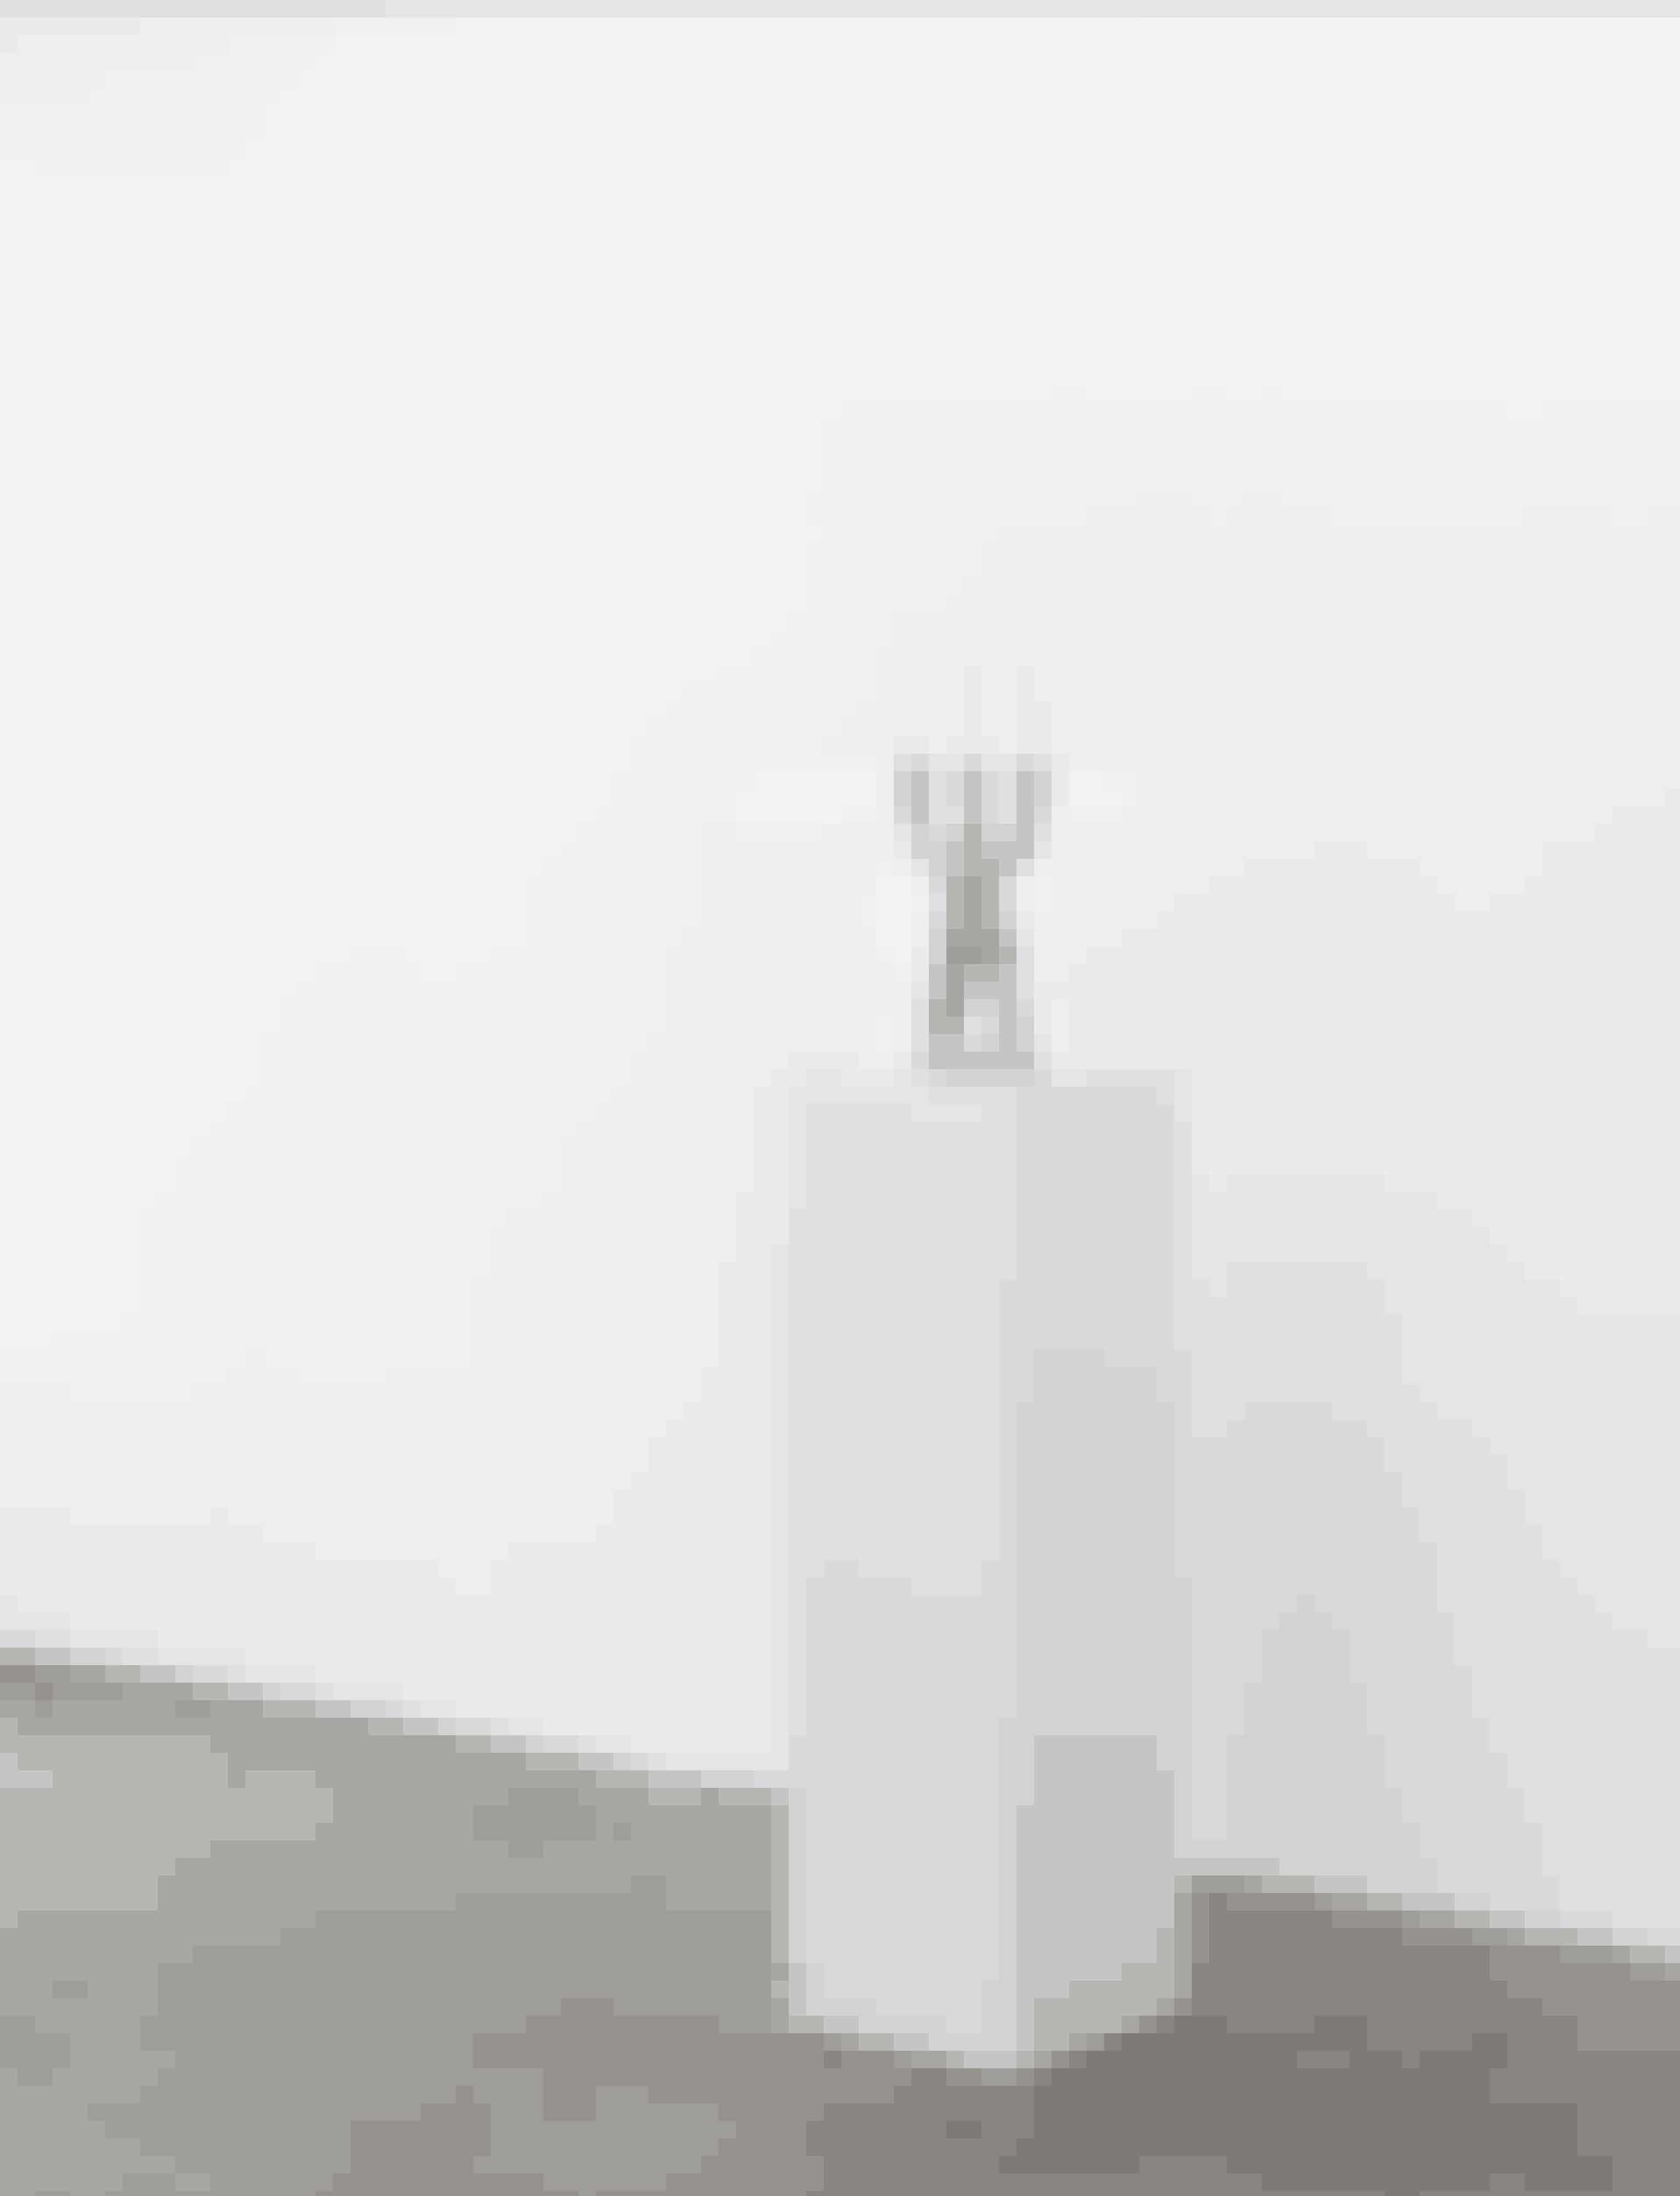 3-armet lysestage af Roma Manikhin, 1.600 kr. Den russiske kunstner Roma Manikhin har skabt et kortspil og to lysestager for Normann Copenhagen – alt sammen objekter, der afspejler Roma Manikhins erotiske og humoristiske univers.